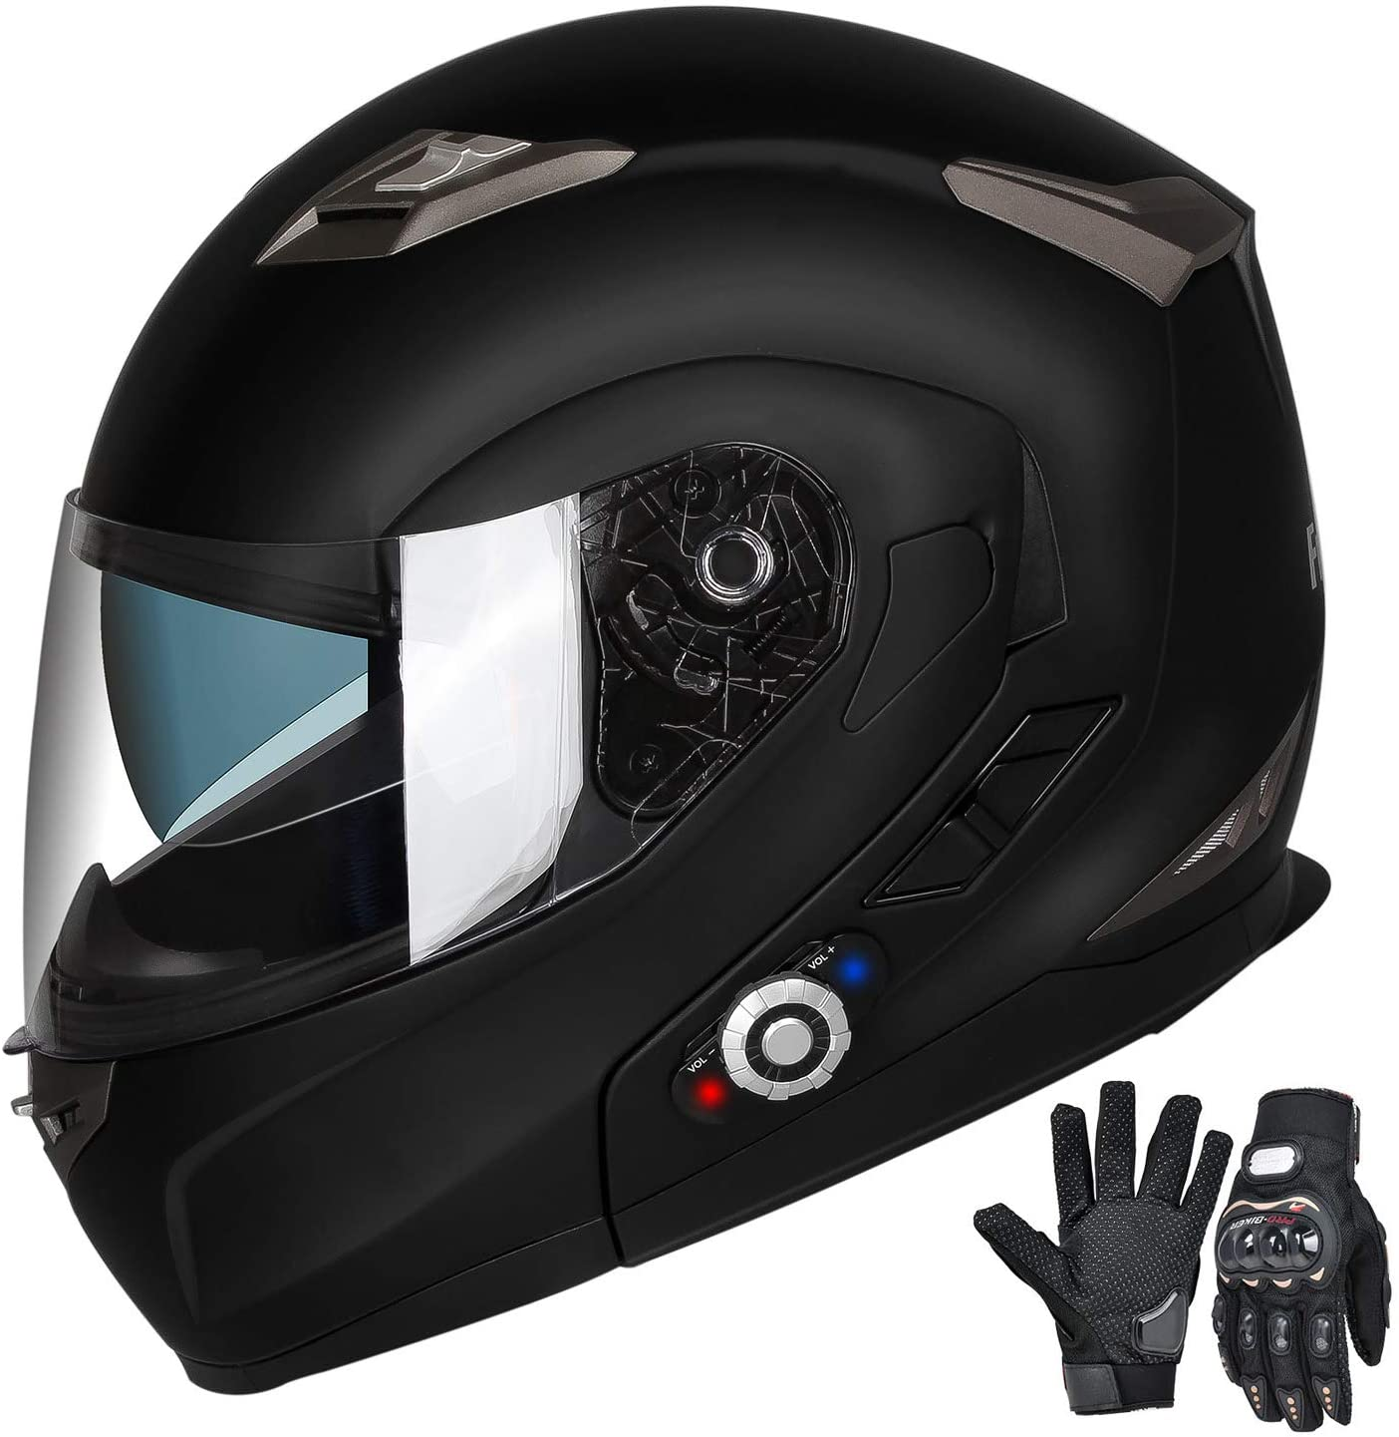 FreedConn Motorcycle Bluetooth Helmets, Modular Flip up Dual Visors Full Face Helmets, DOT Approved Helmet, Built-in Mp3 FM Radio Integrated Intercom Communication System